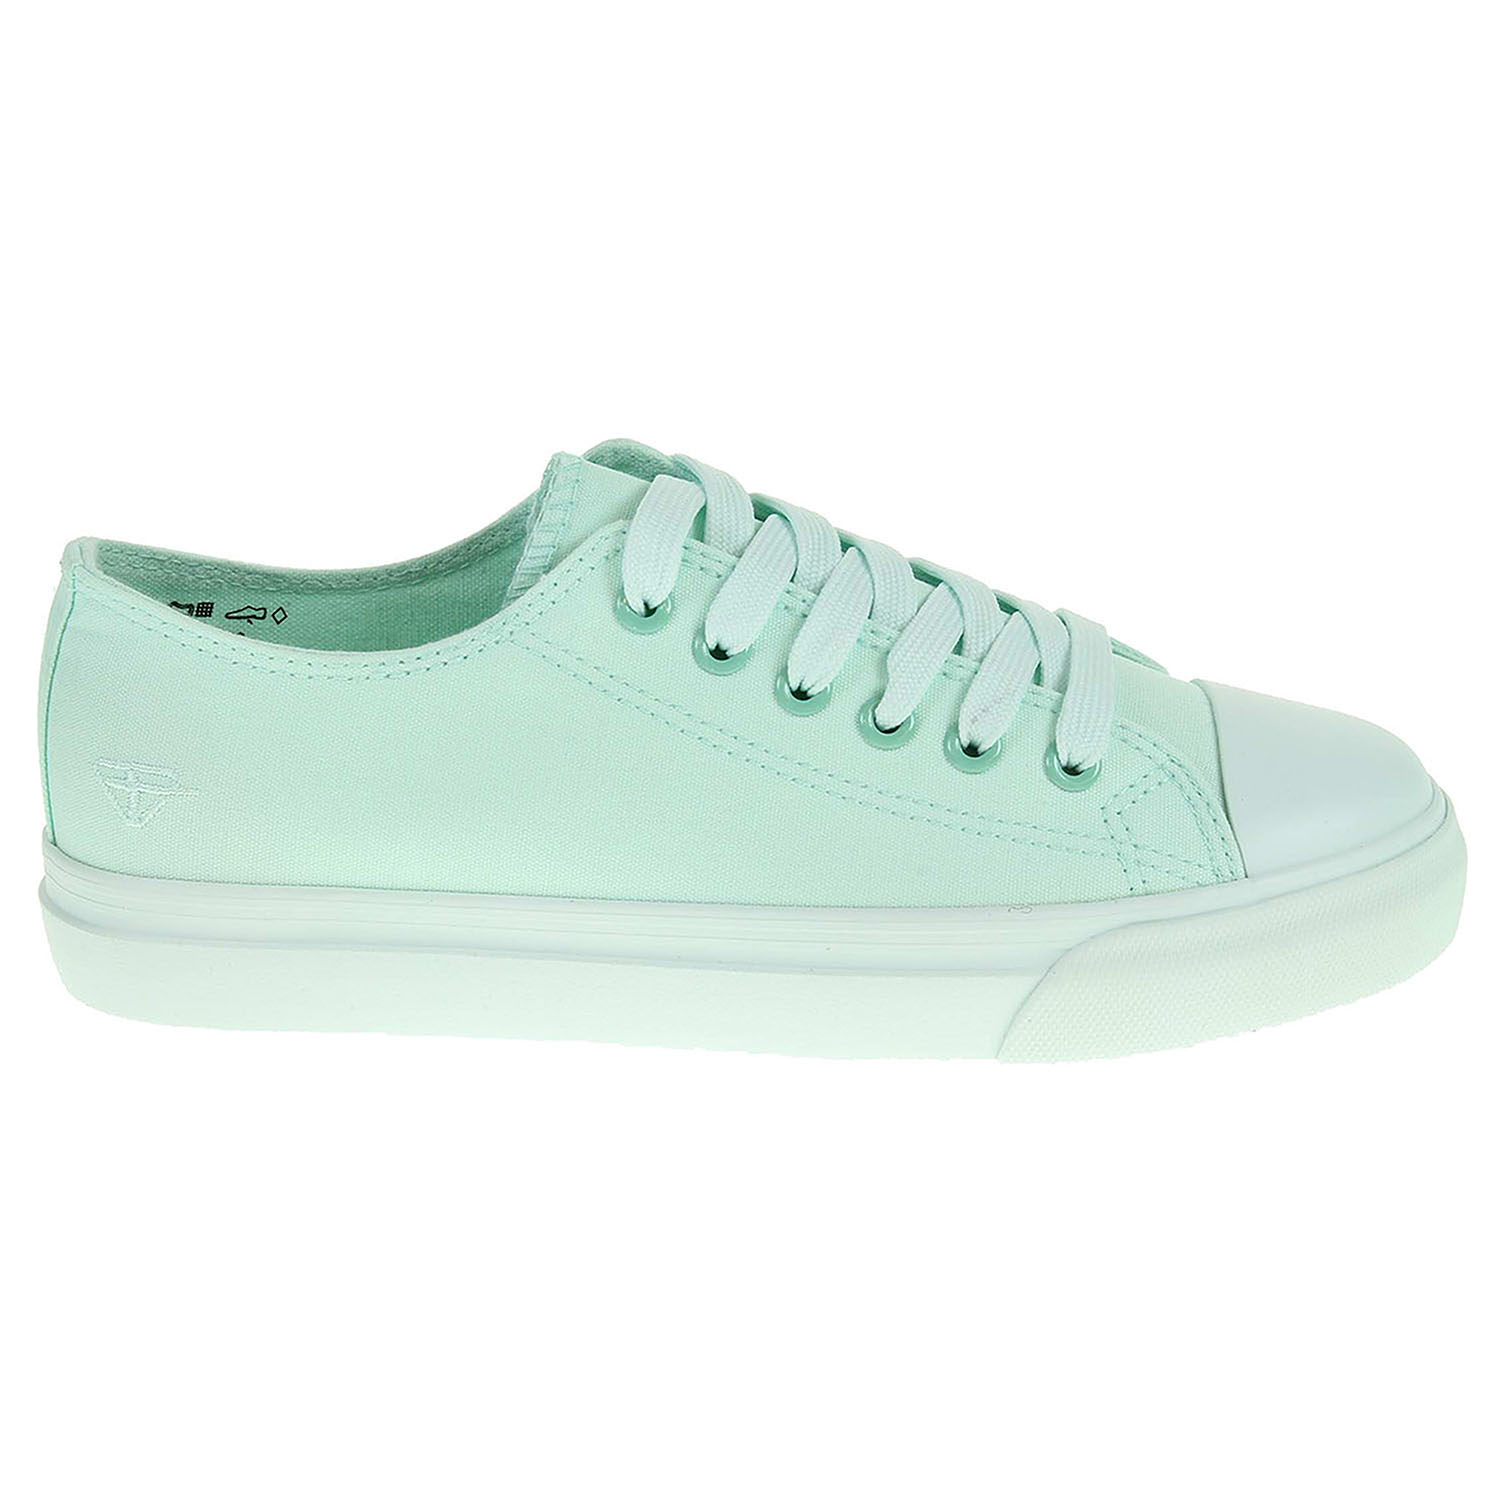 Ecco Tamaris dámská obuv 1-23600-28 zelená 23200656